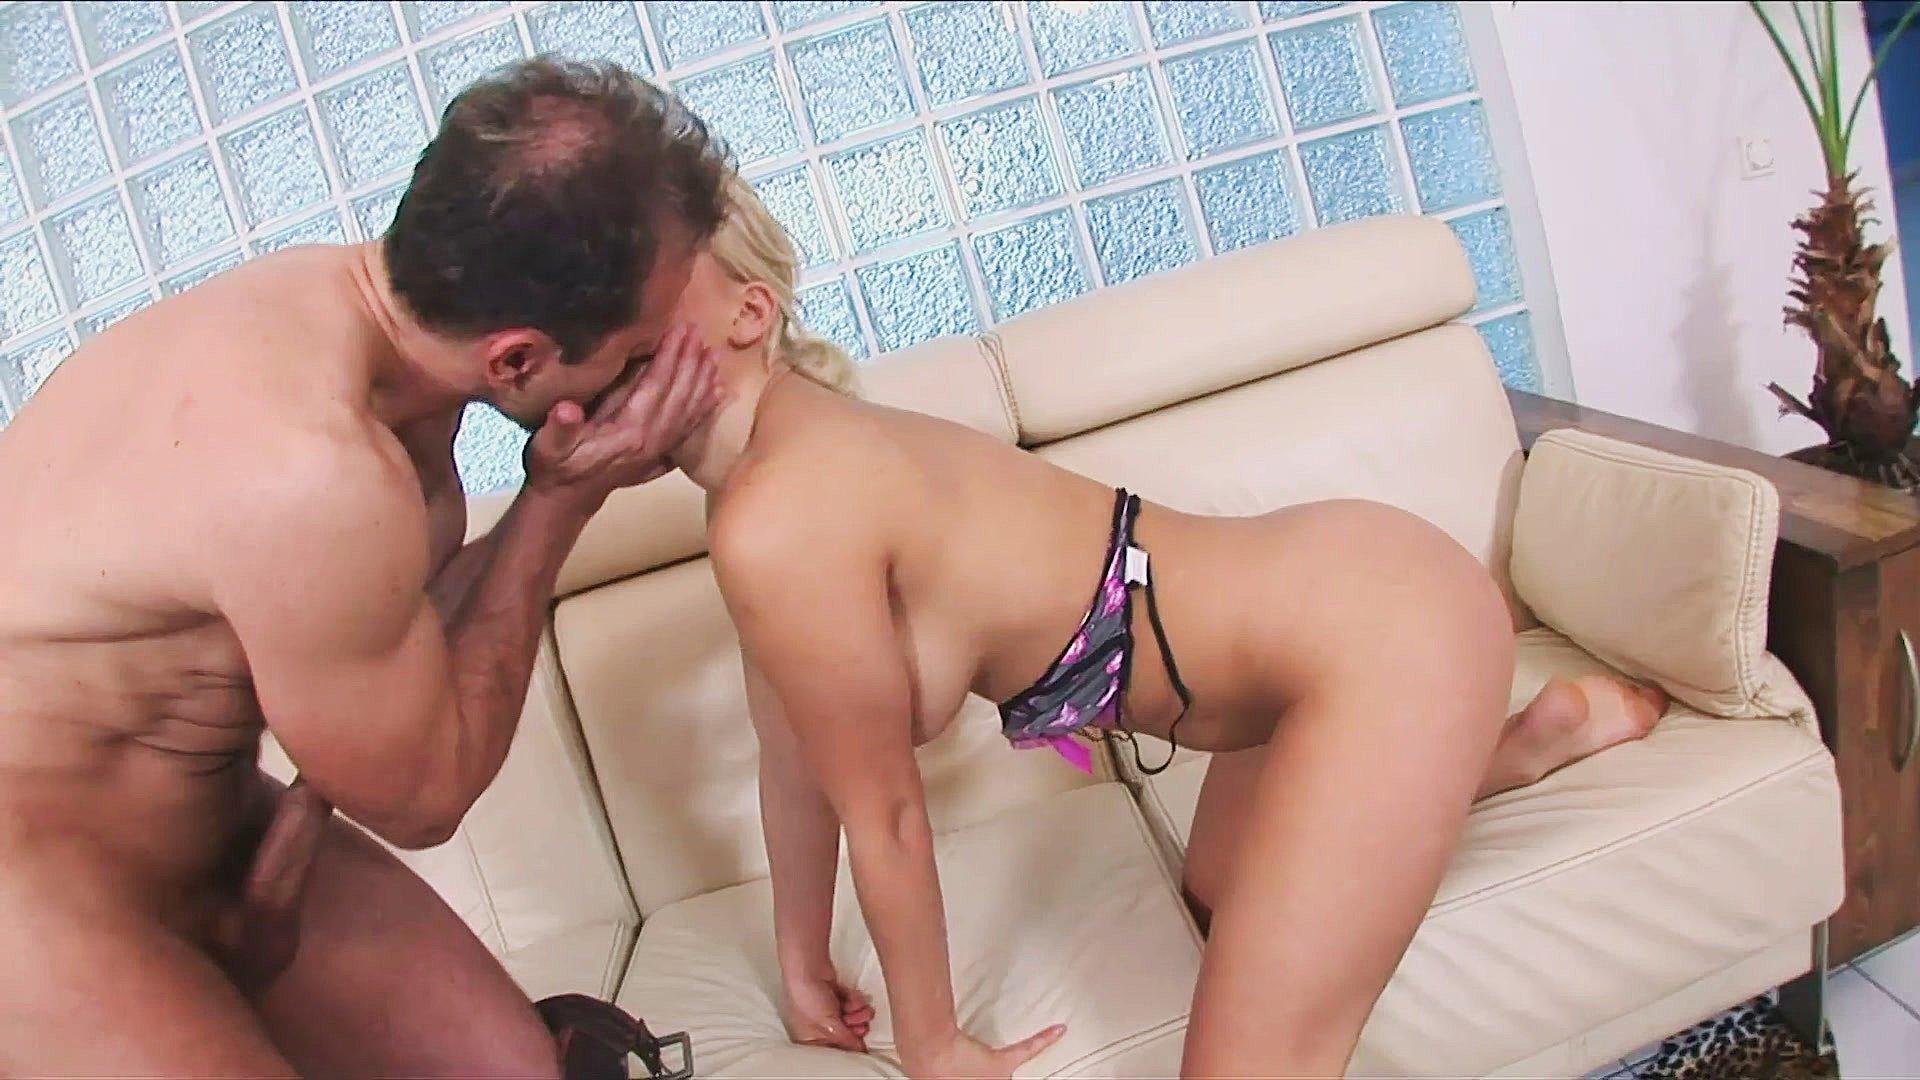 Porn Pix Aria nude in shower